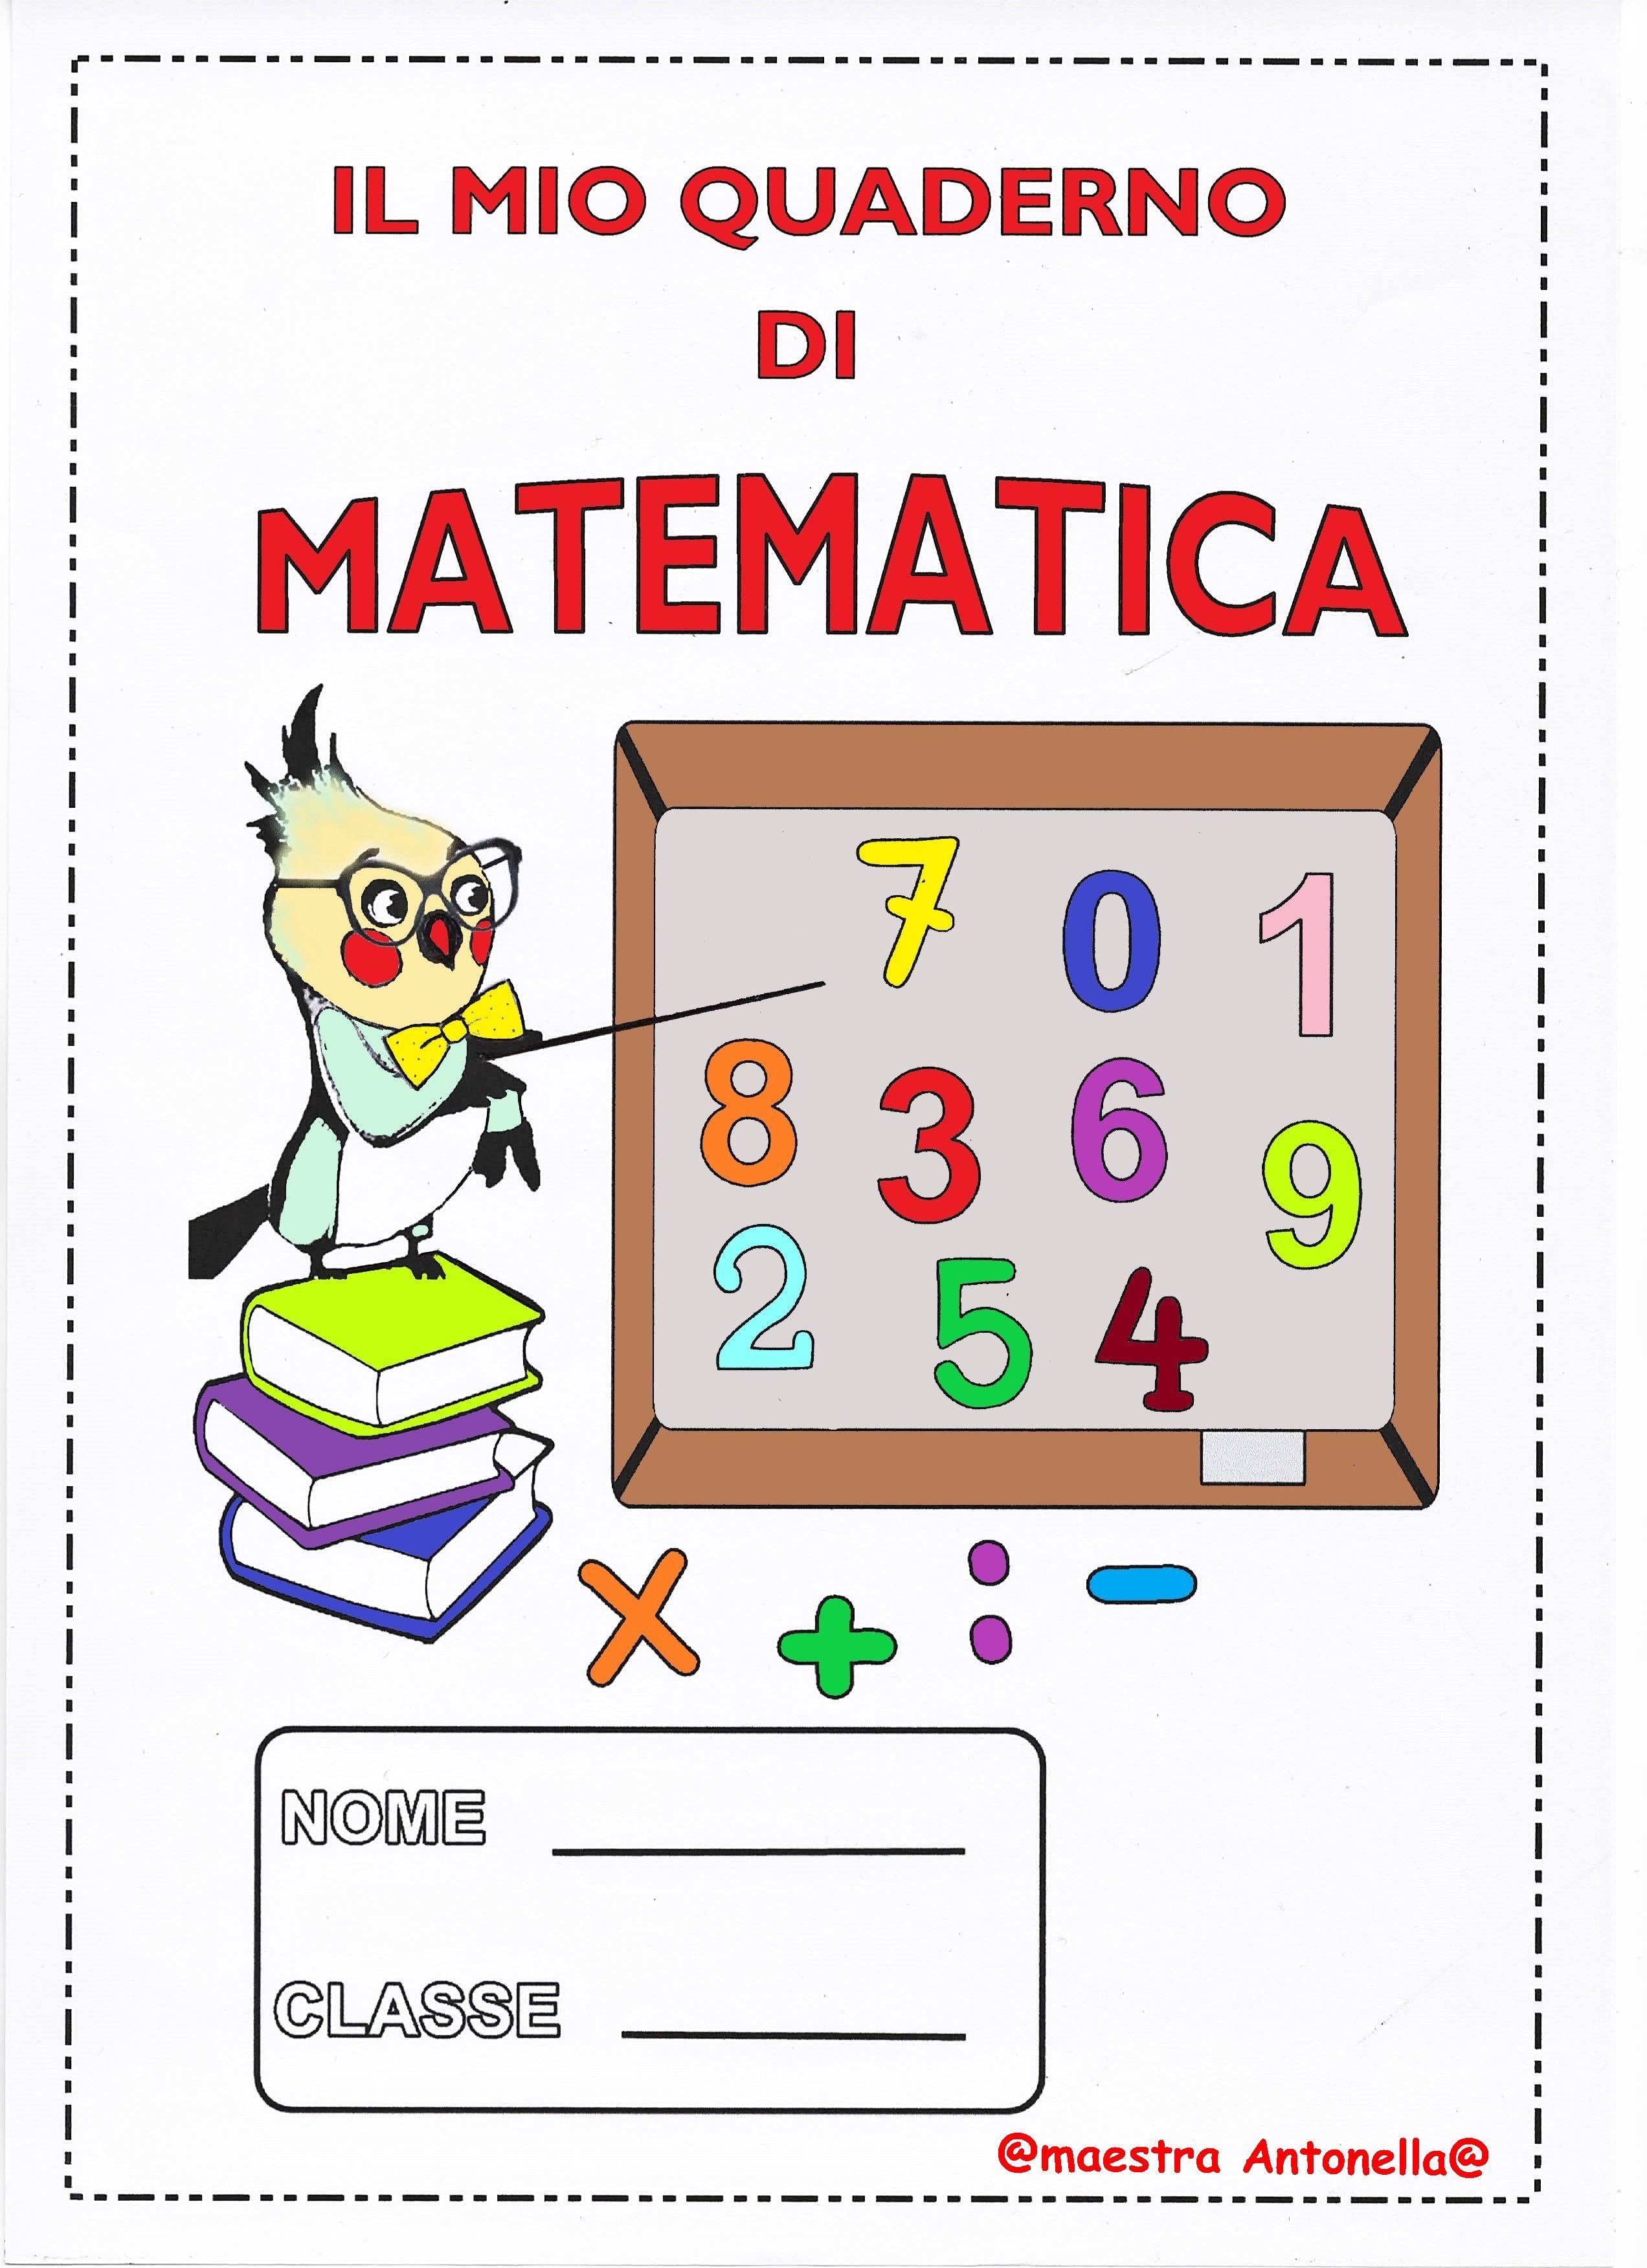 Copertina Quaderno Di Matematica Copertine Per Quaderni